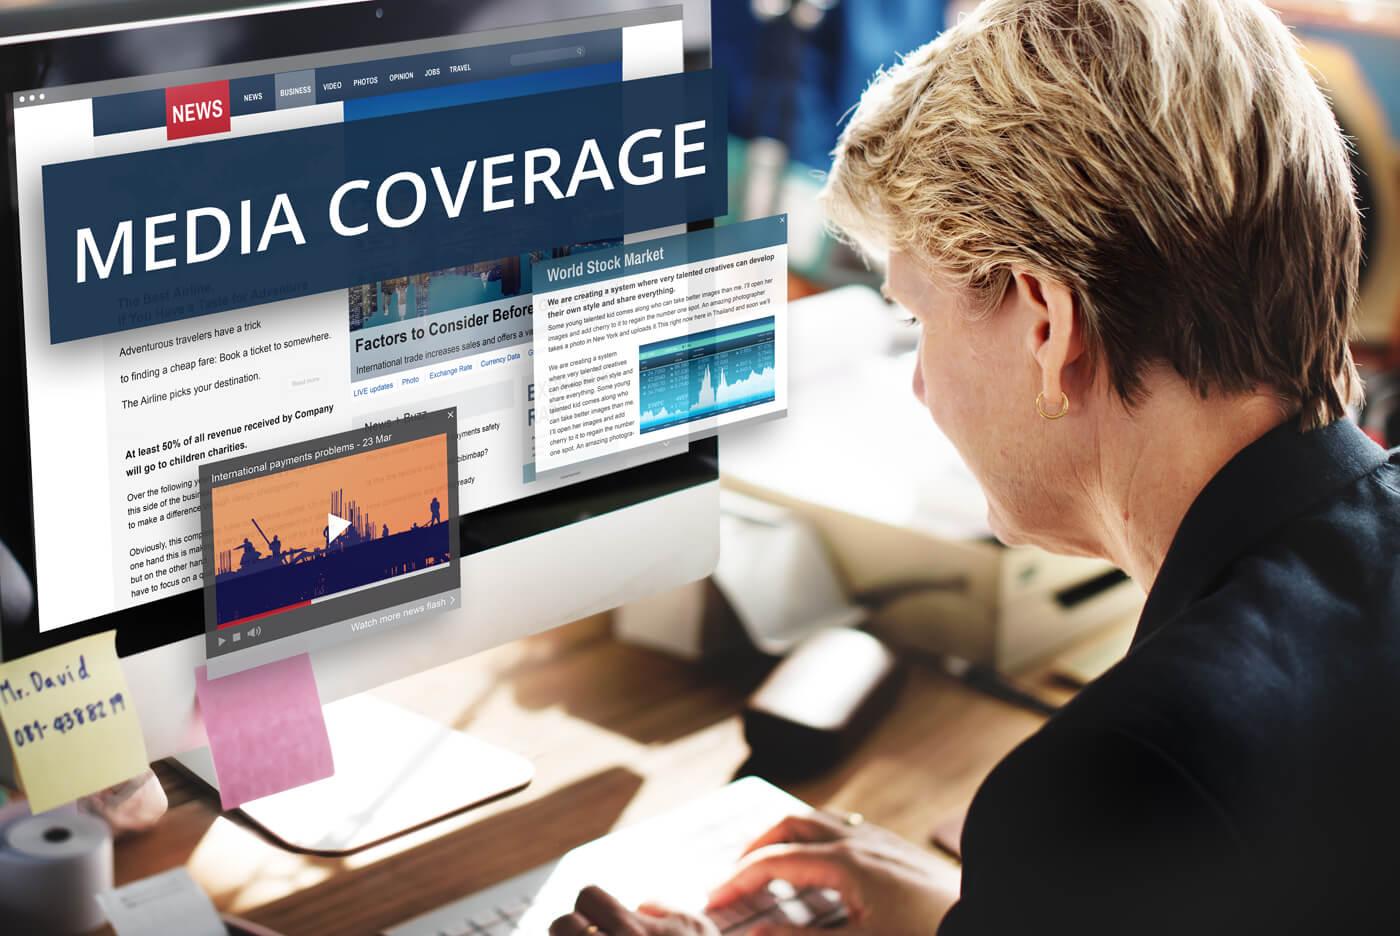 New Media Coverage